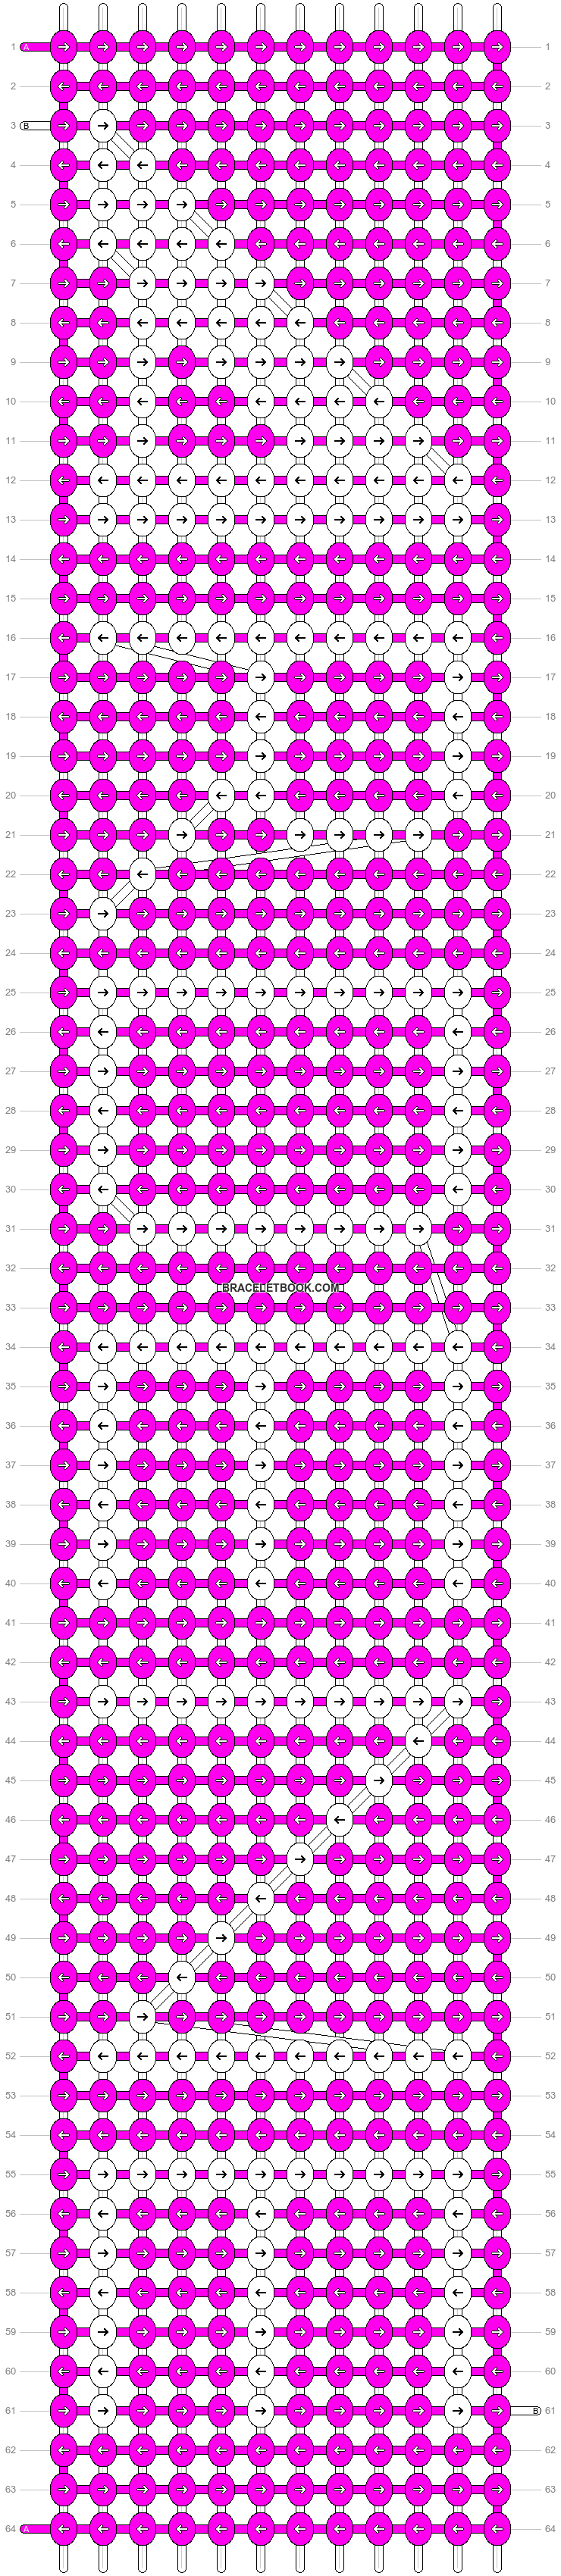 Alpha pattern #11750 pattern